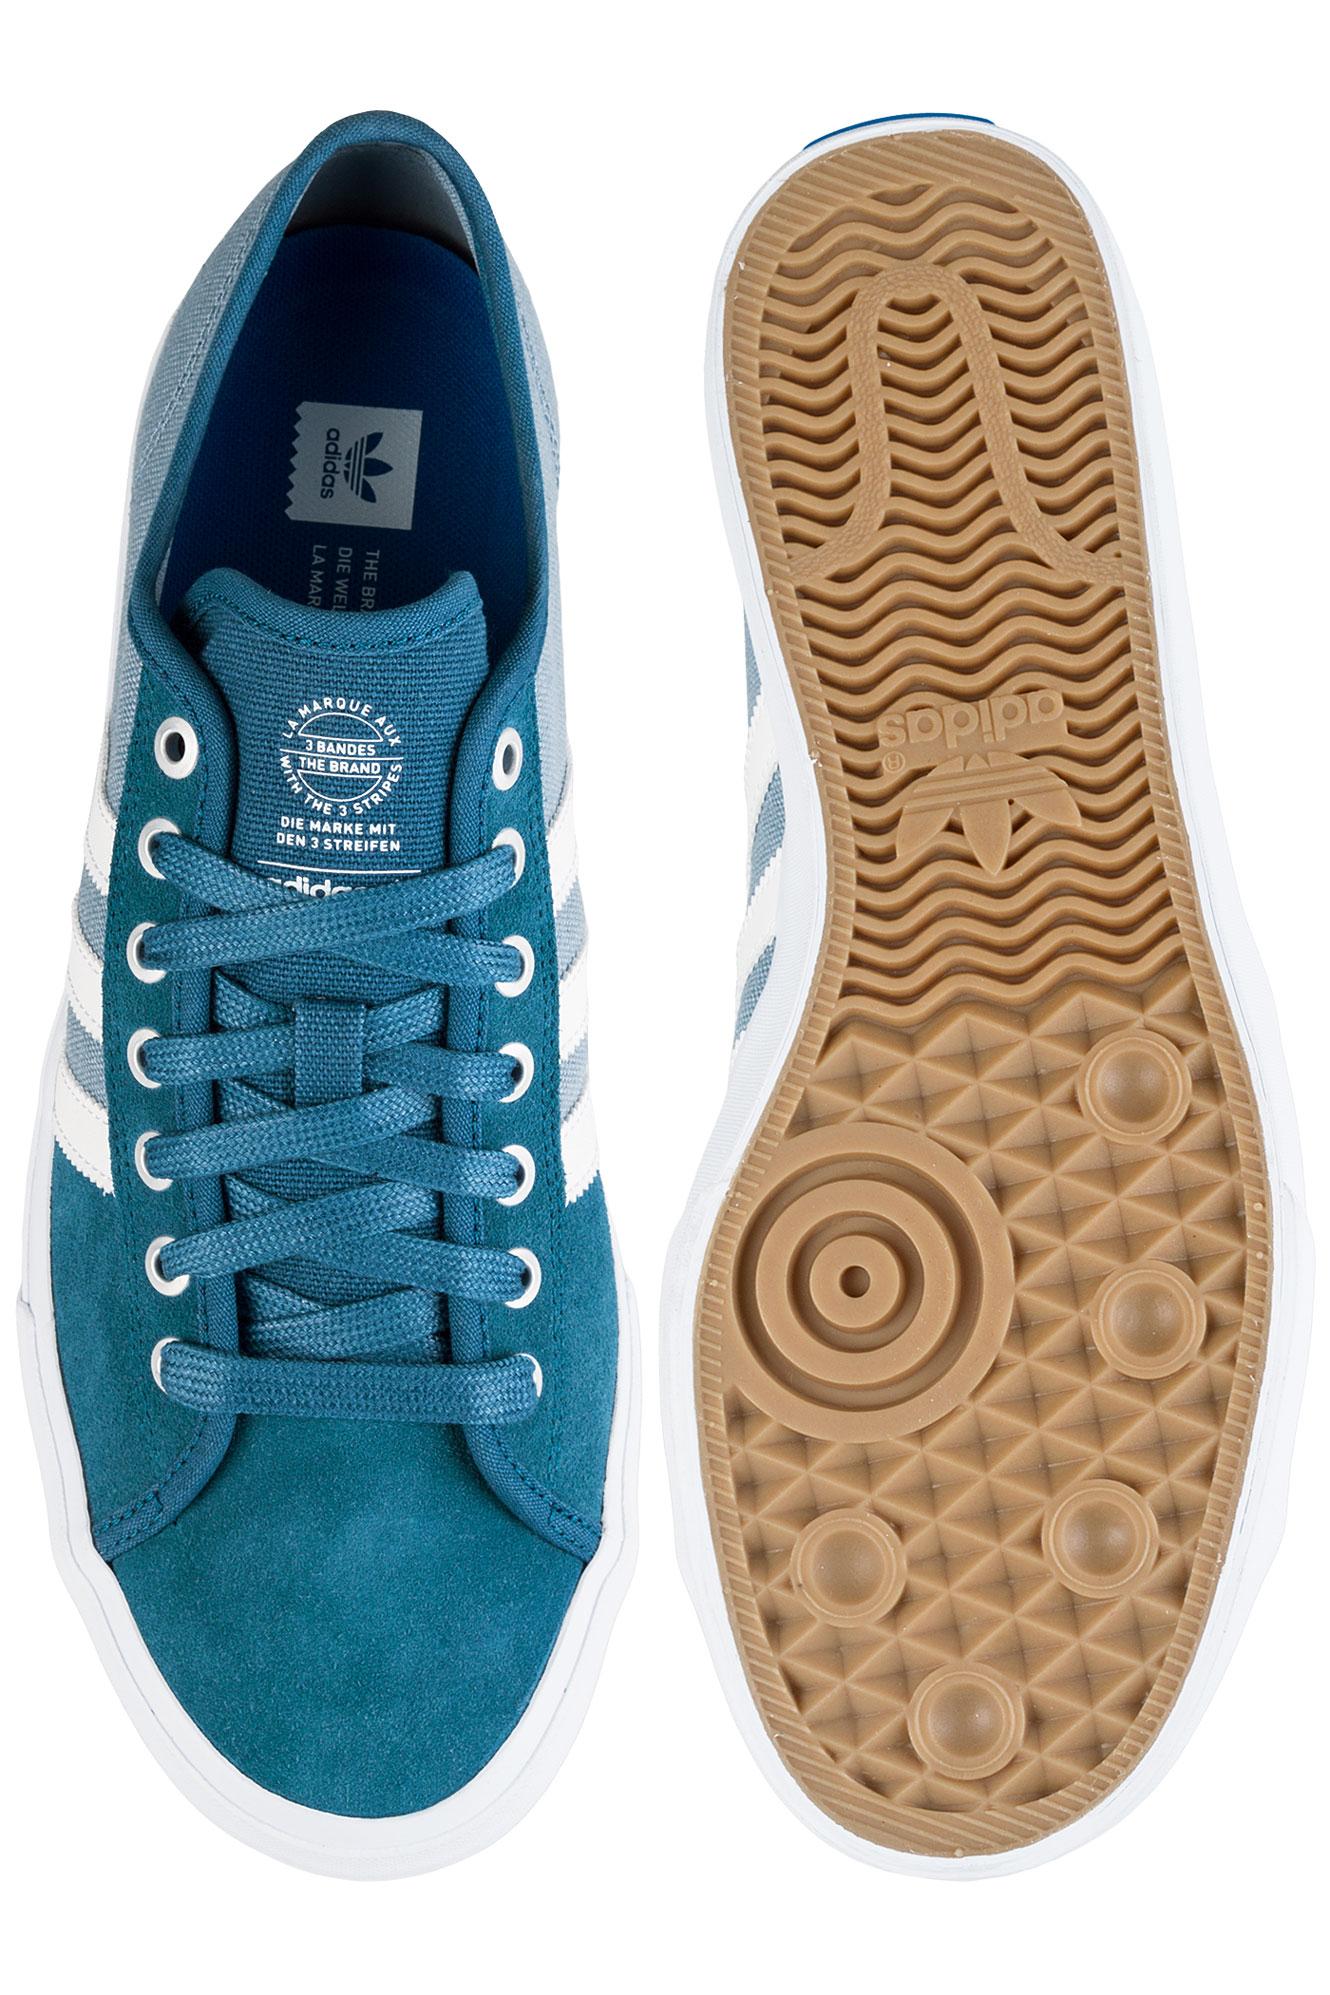 online retailer be63f 569d3 ... adidas Skateboarding Matchcourt RX Chaussure (core blue white) ...